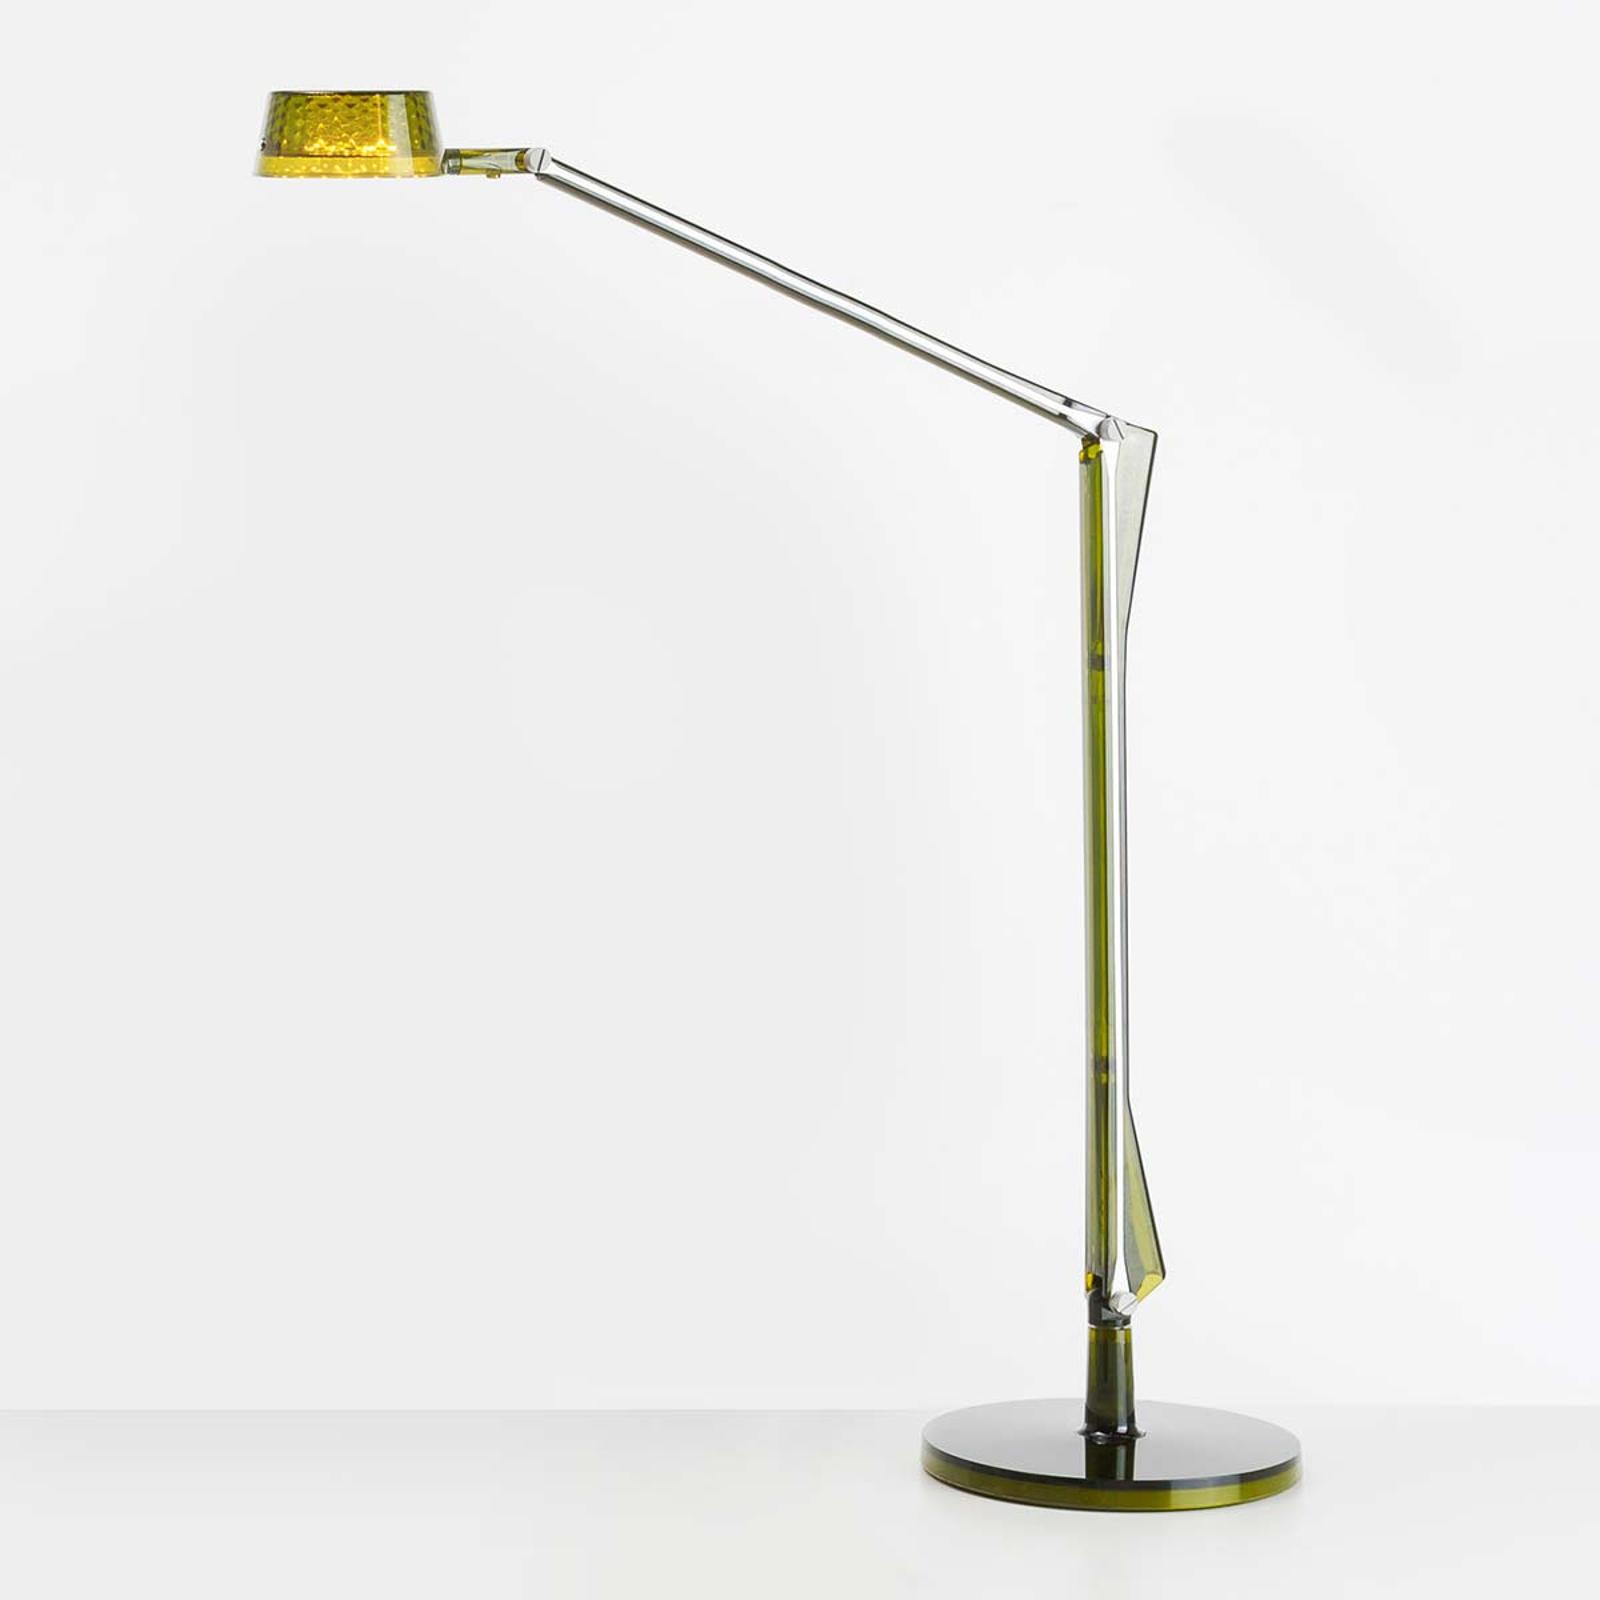 Verstelbare LED tafellamp Aledin Dec, groen